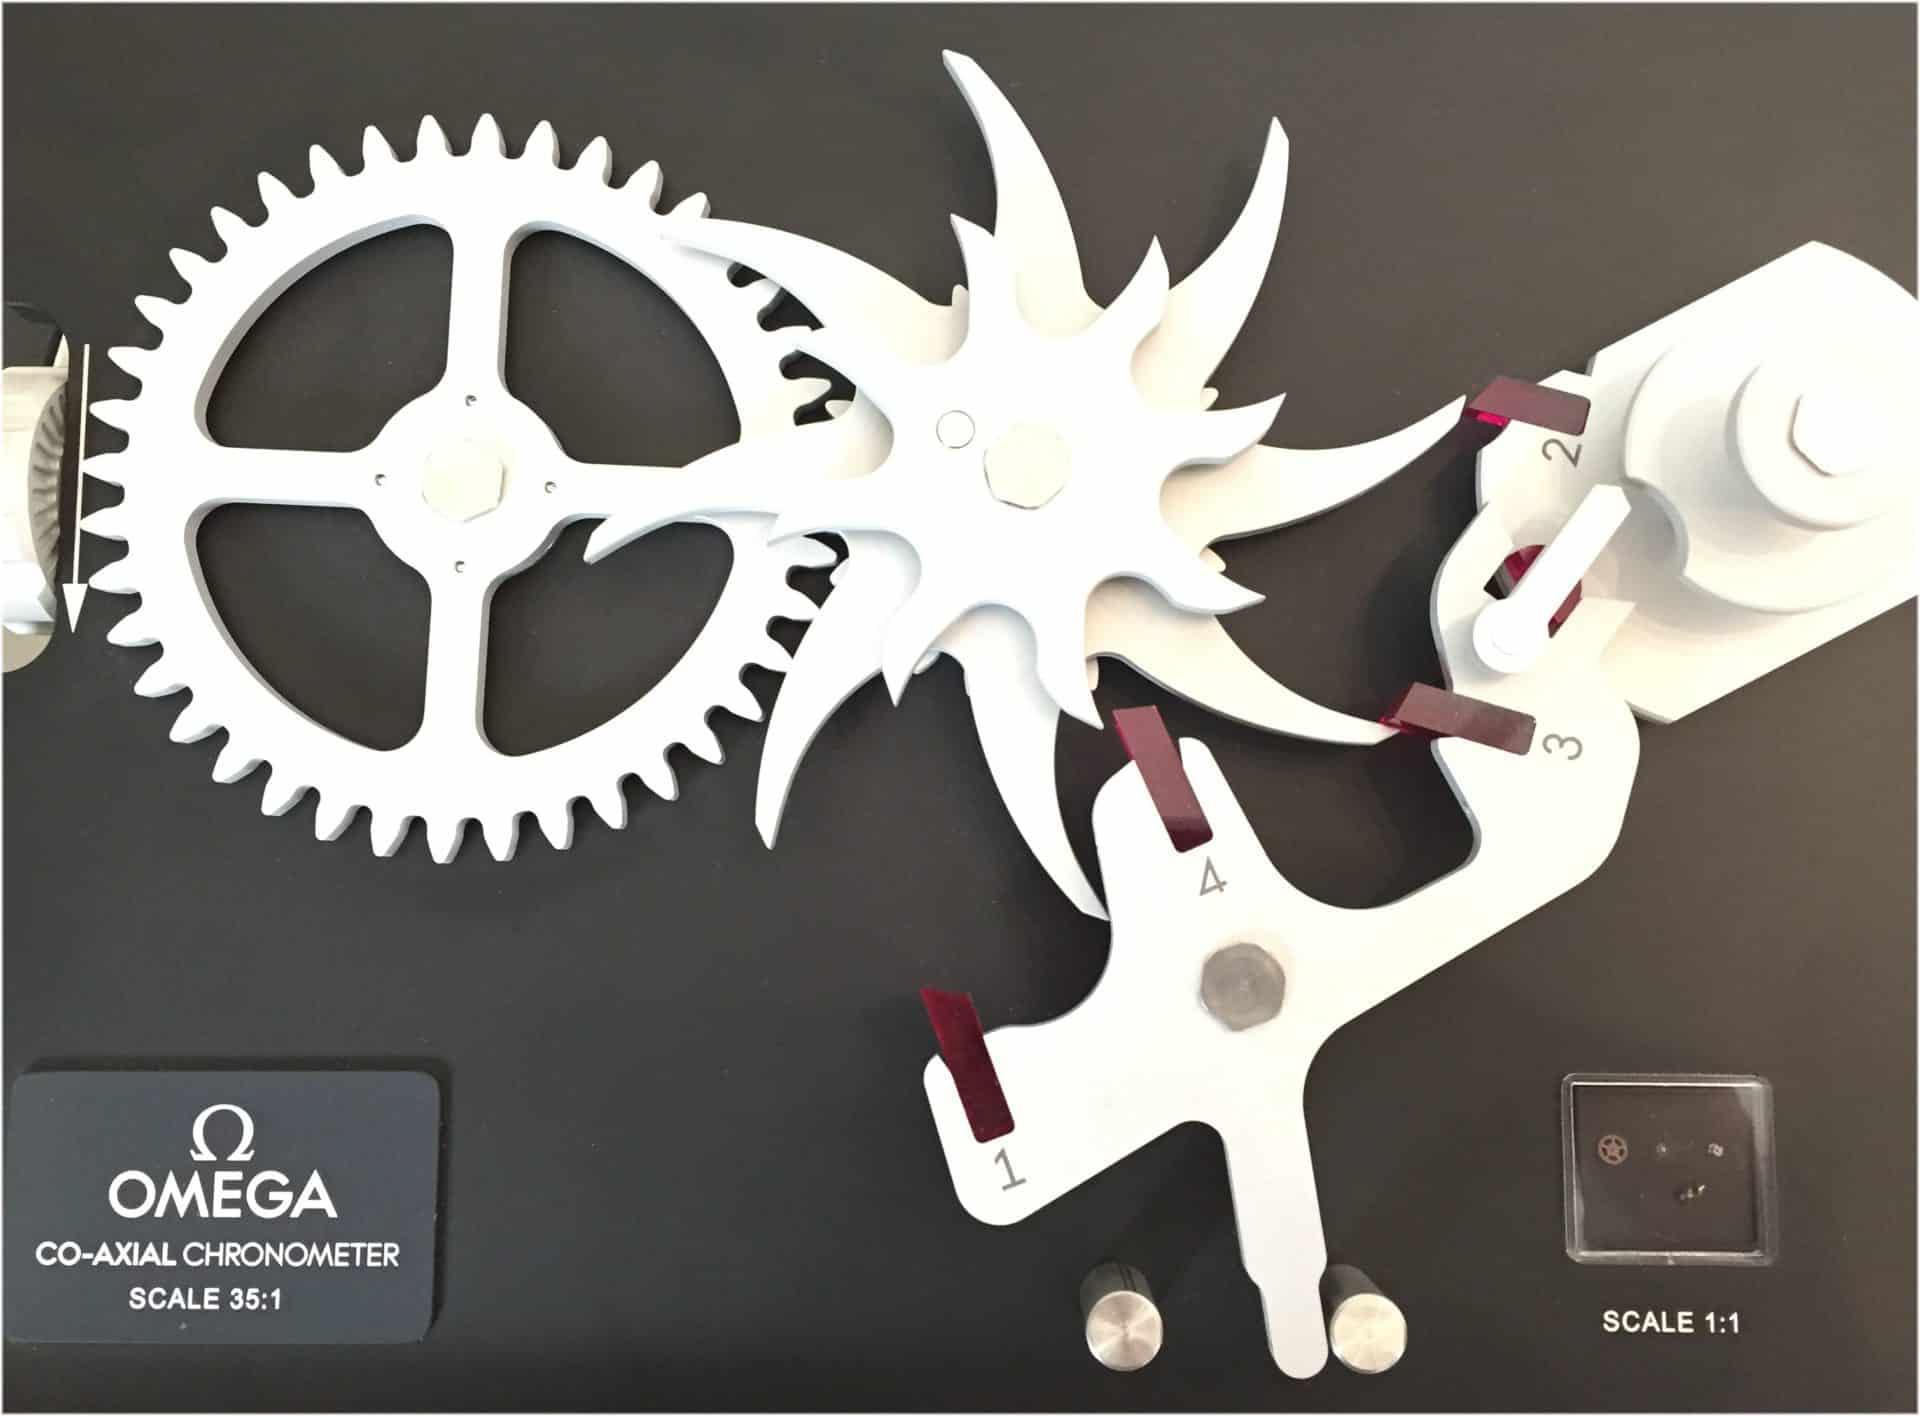 Omega Co Axial Chronometer